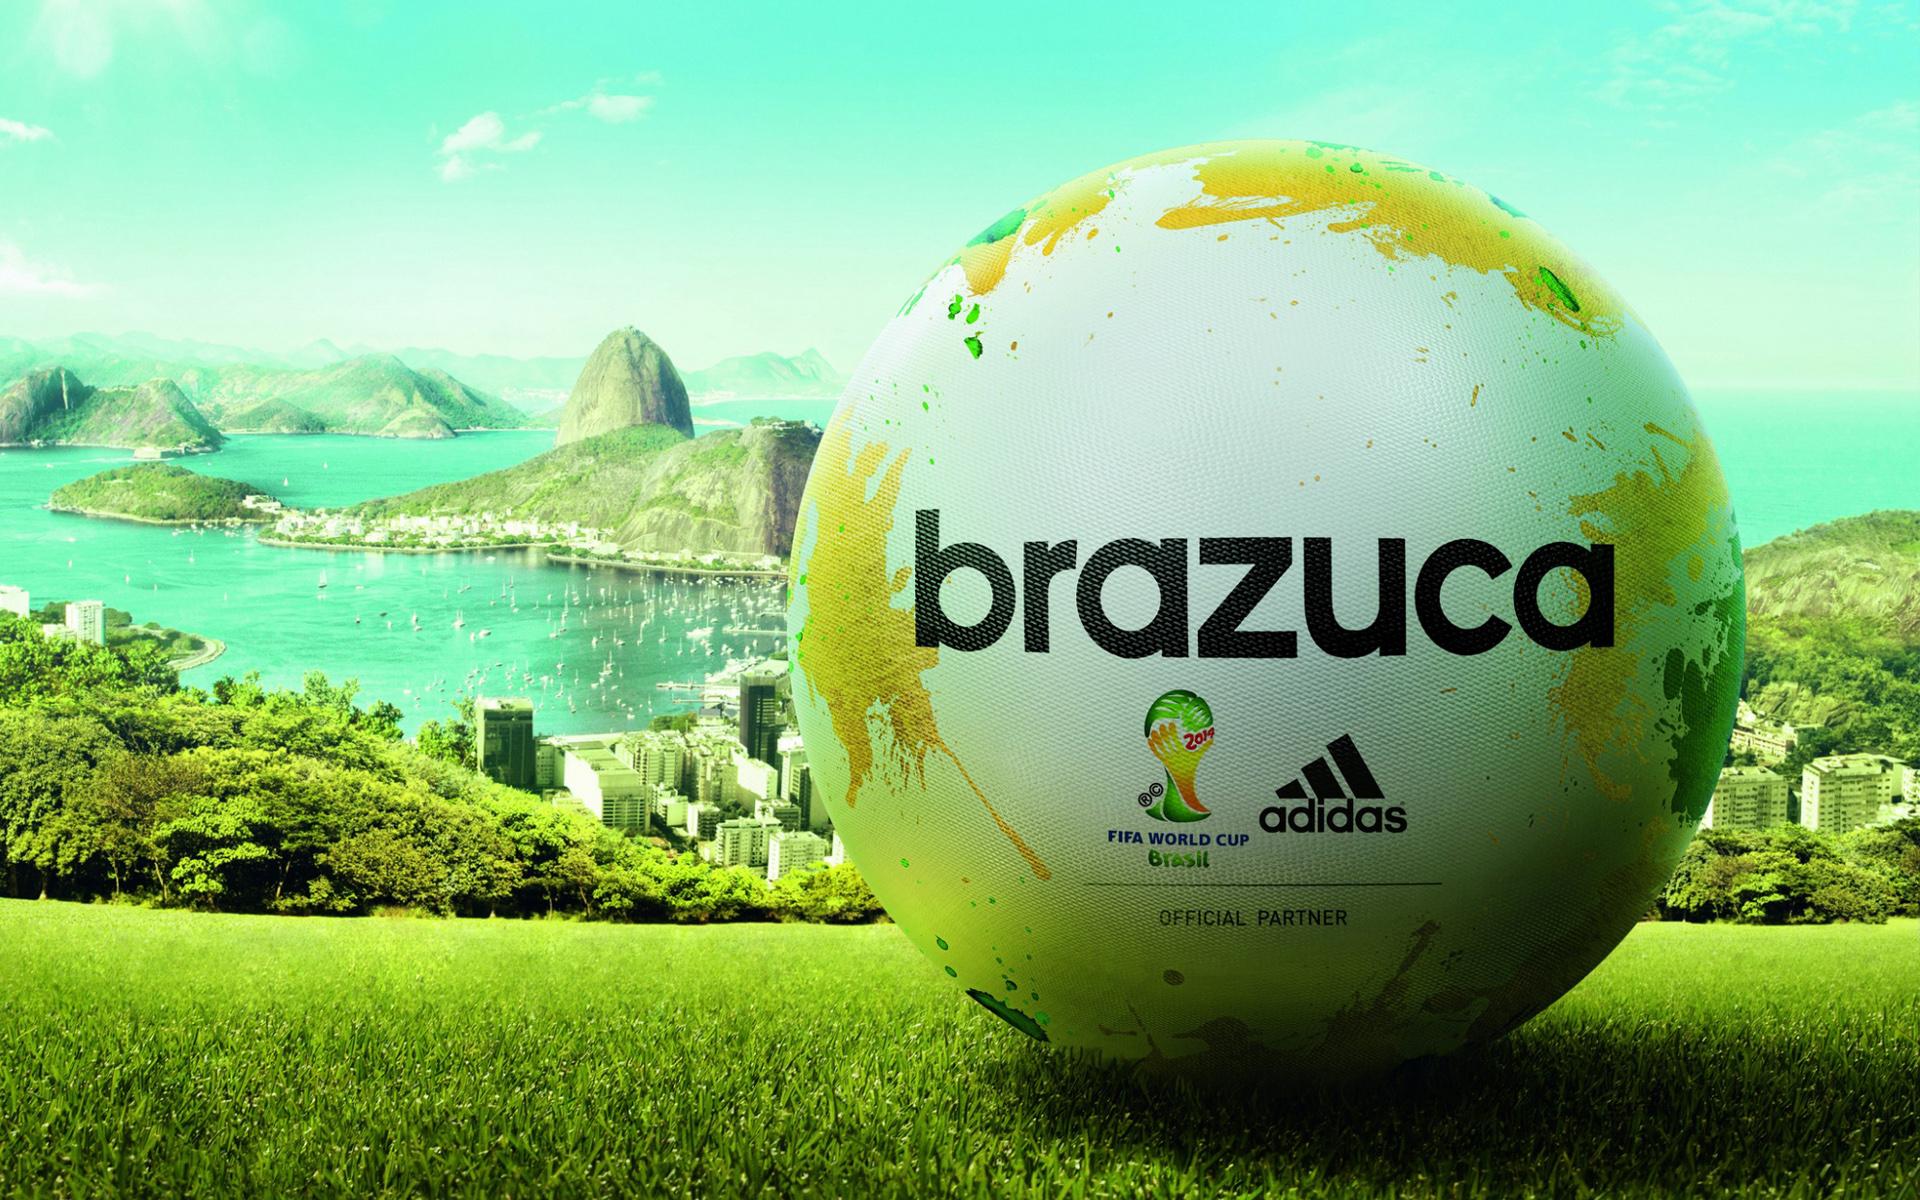 HD Wallpapers Adidas Brazuca Match Ball FIFA World Cup 2014